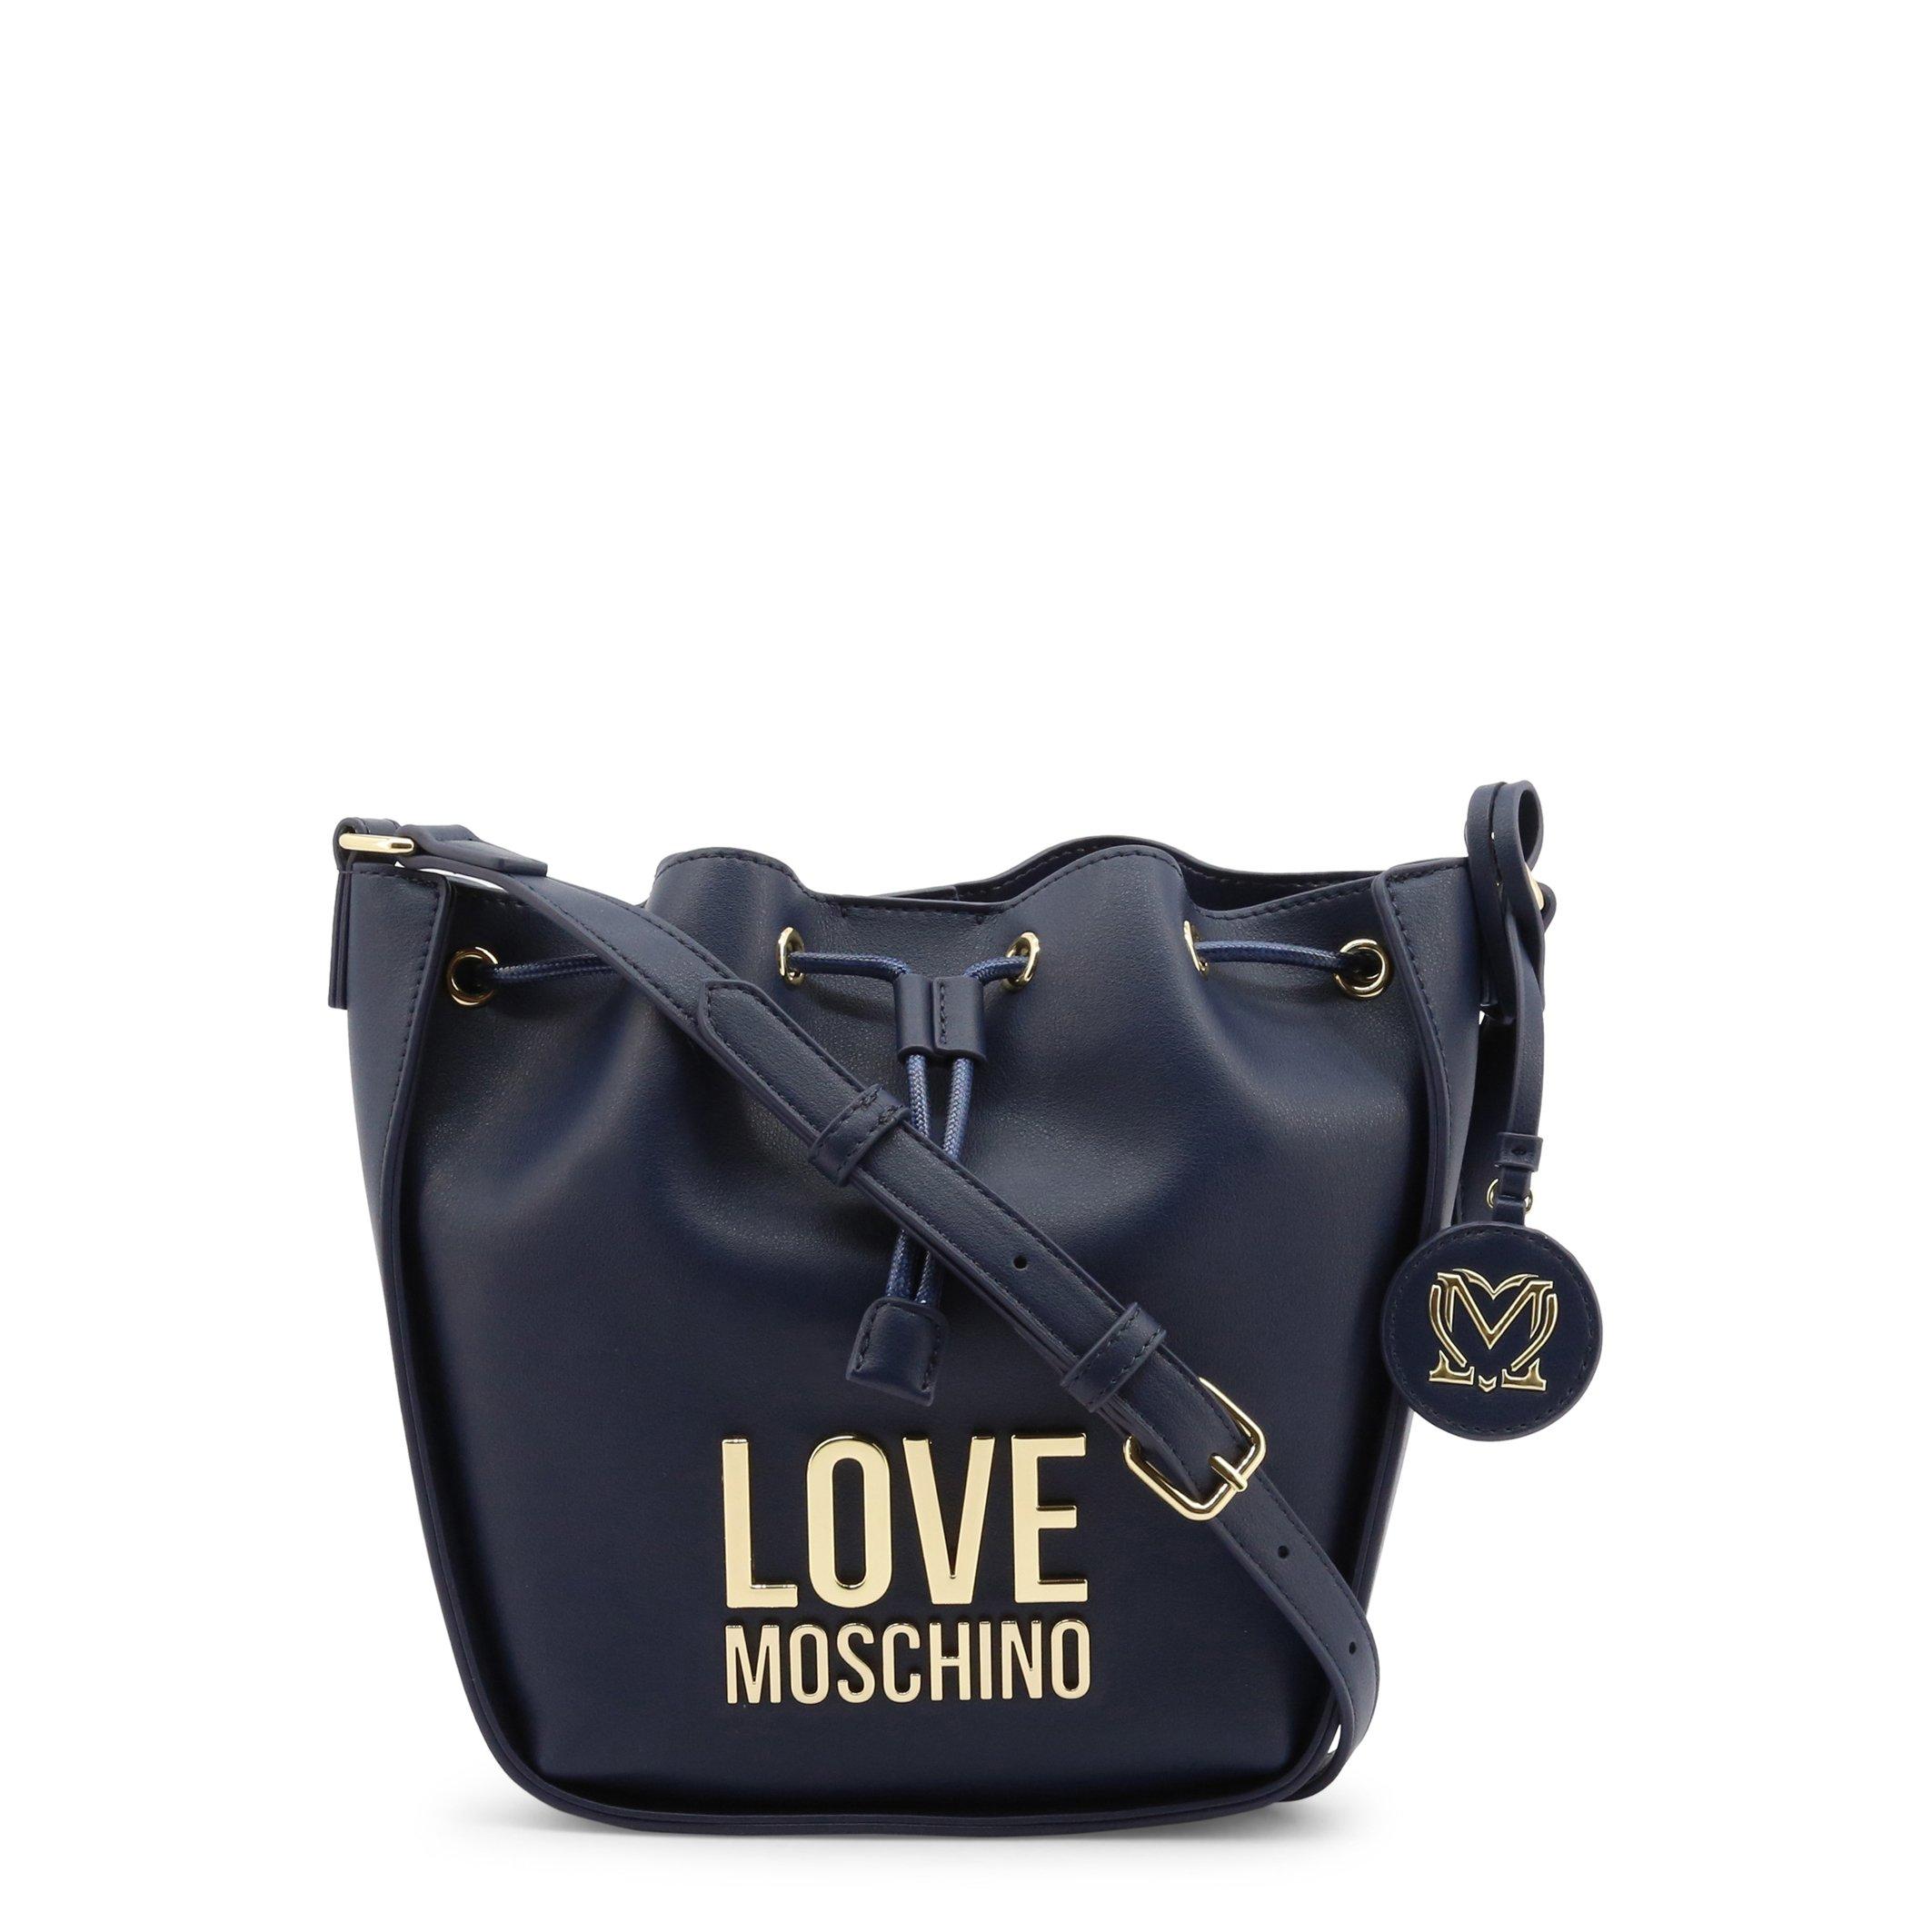 Love Moschino Women's Shoulder Bag Various Colours JC4103PP1DLJ0 - blue NOSIZE